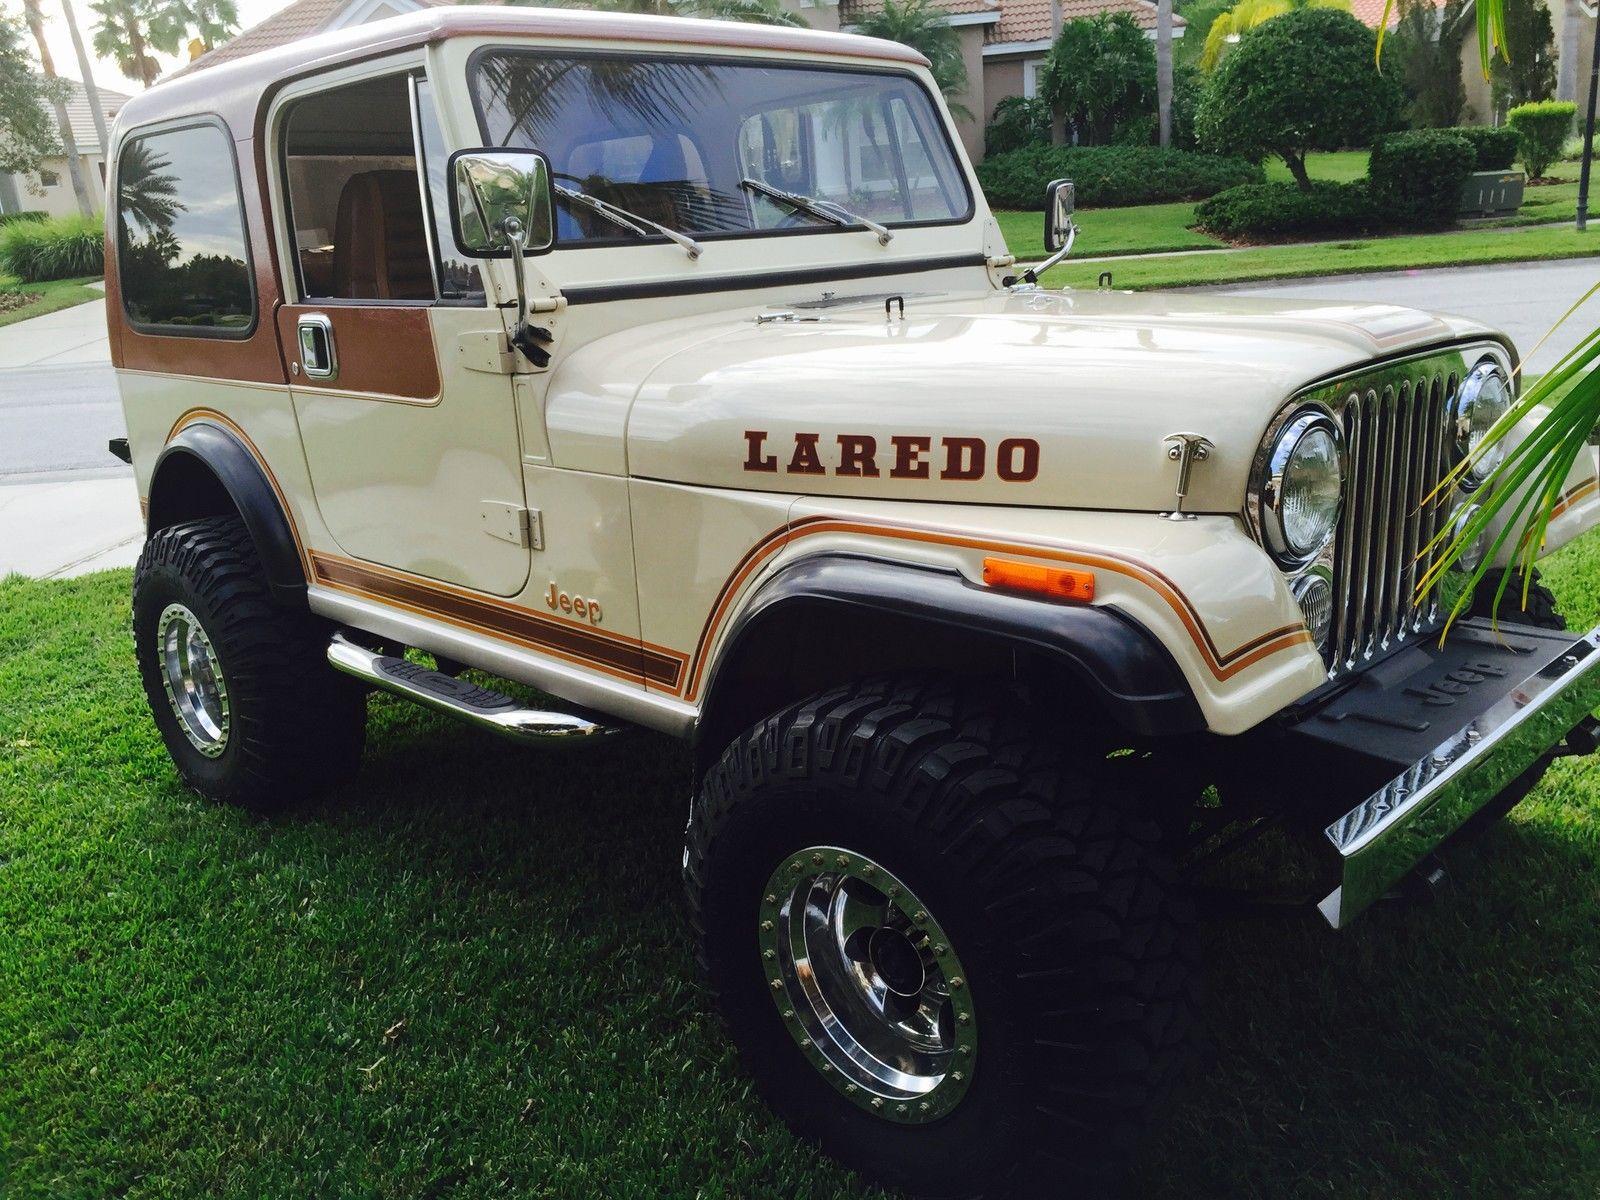 Jeep Cj Laredo K Original Miles Exceptional Condition on 2 Door Manual Jeep For Sale